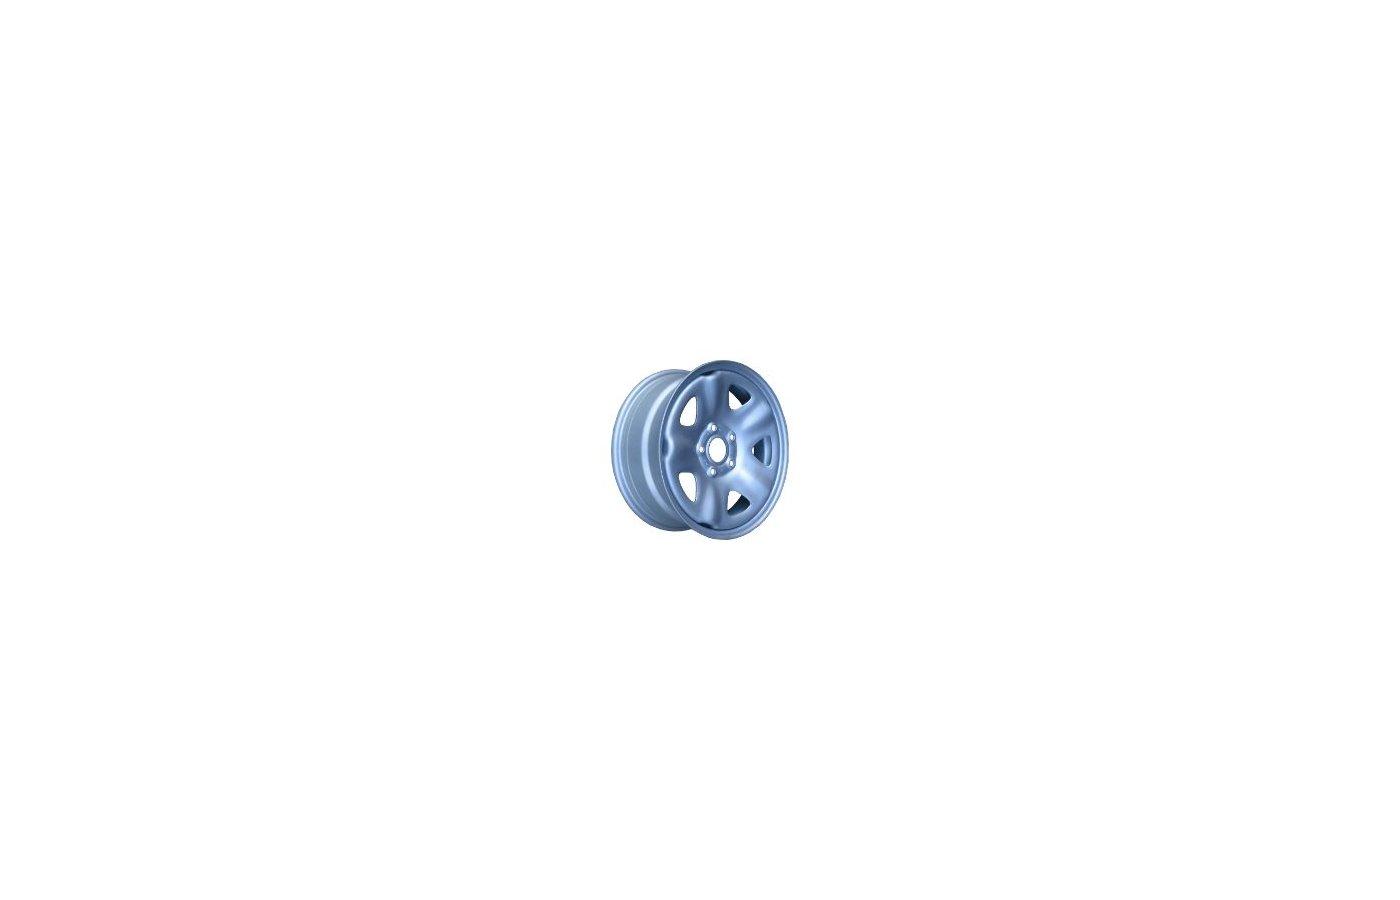 Диск ГАЗ Волга 31105 6.5x15/5x108 D58.1 ET45